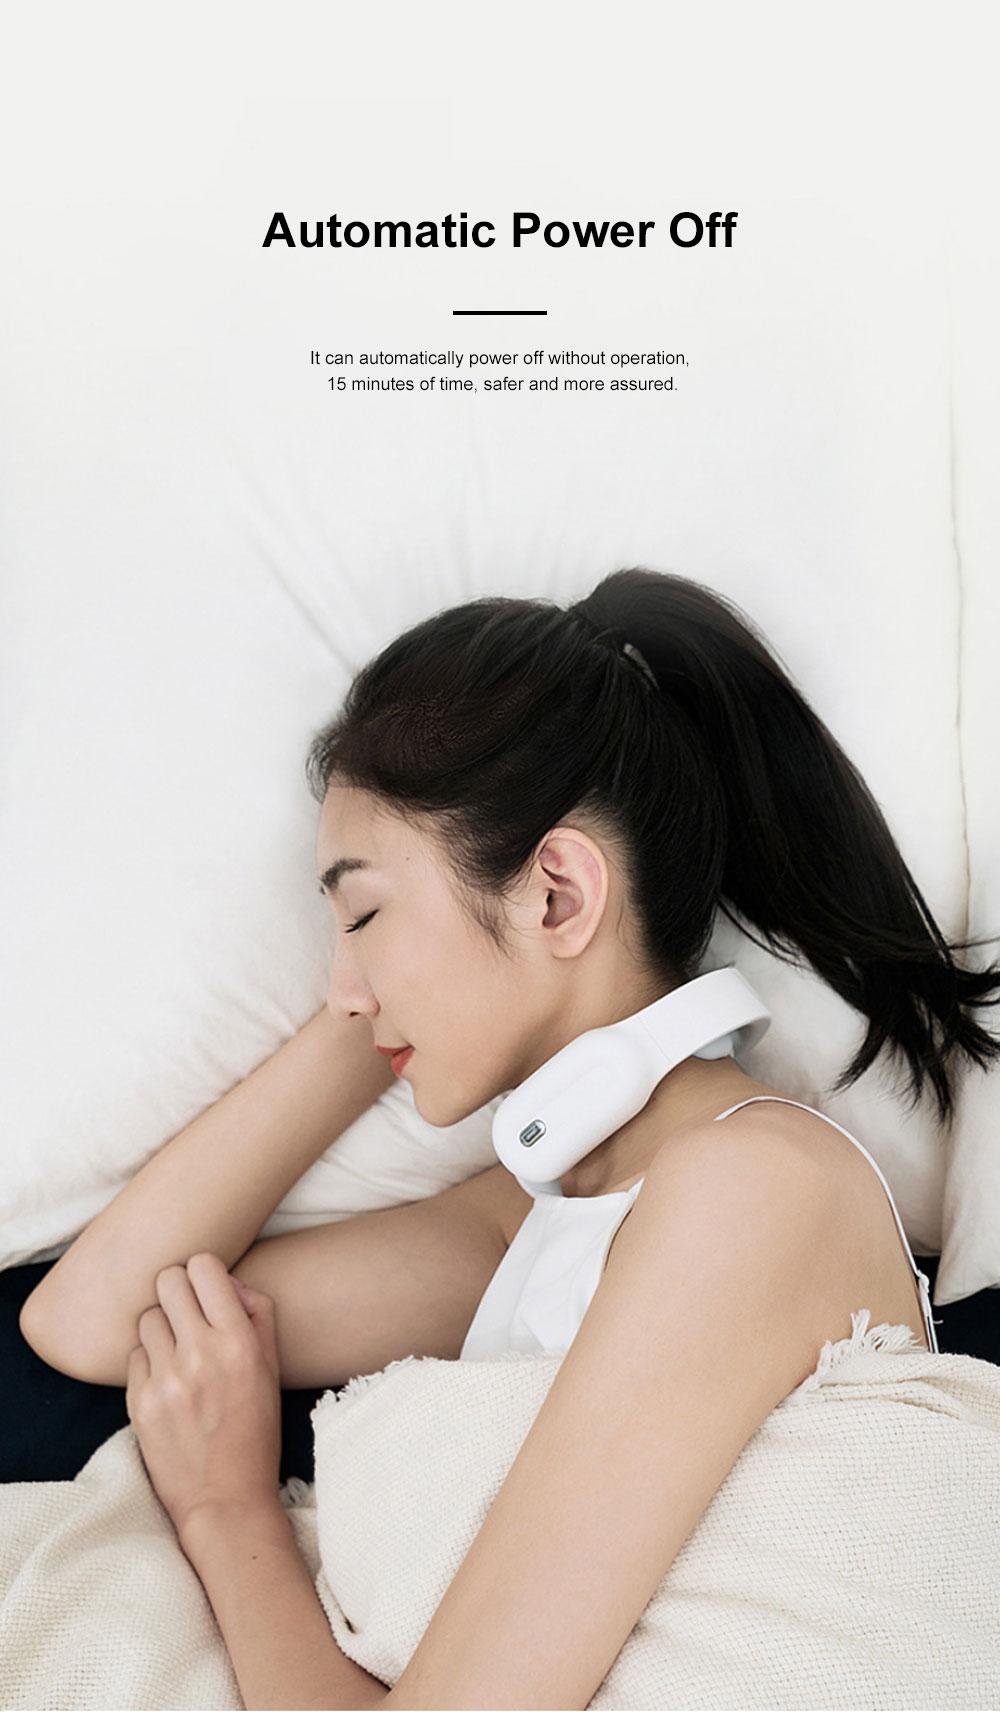 Household Electric Neck Massage Instrument Intelligent Multifunctional Nursing Instrument for Neck Shoulder Waist and Neck 6